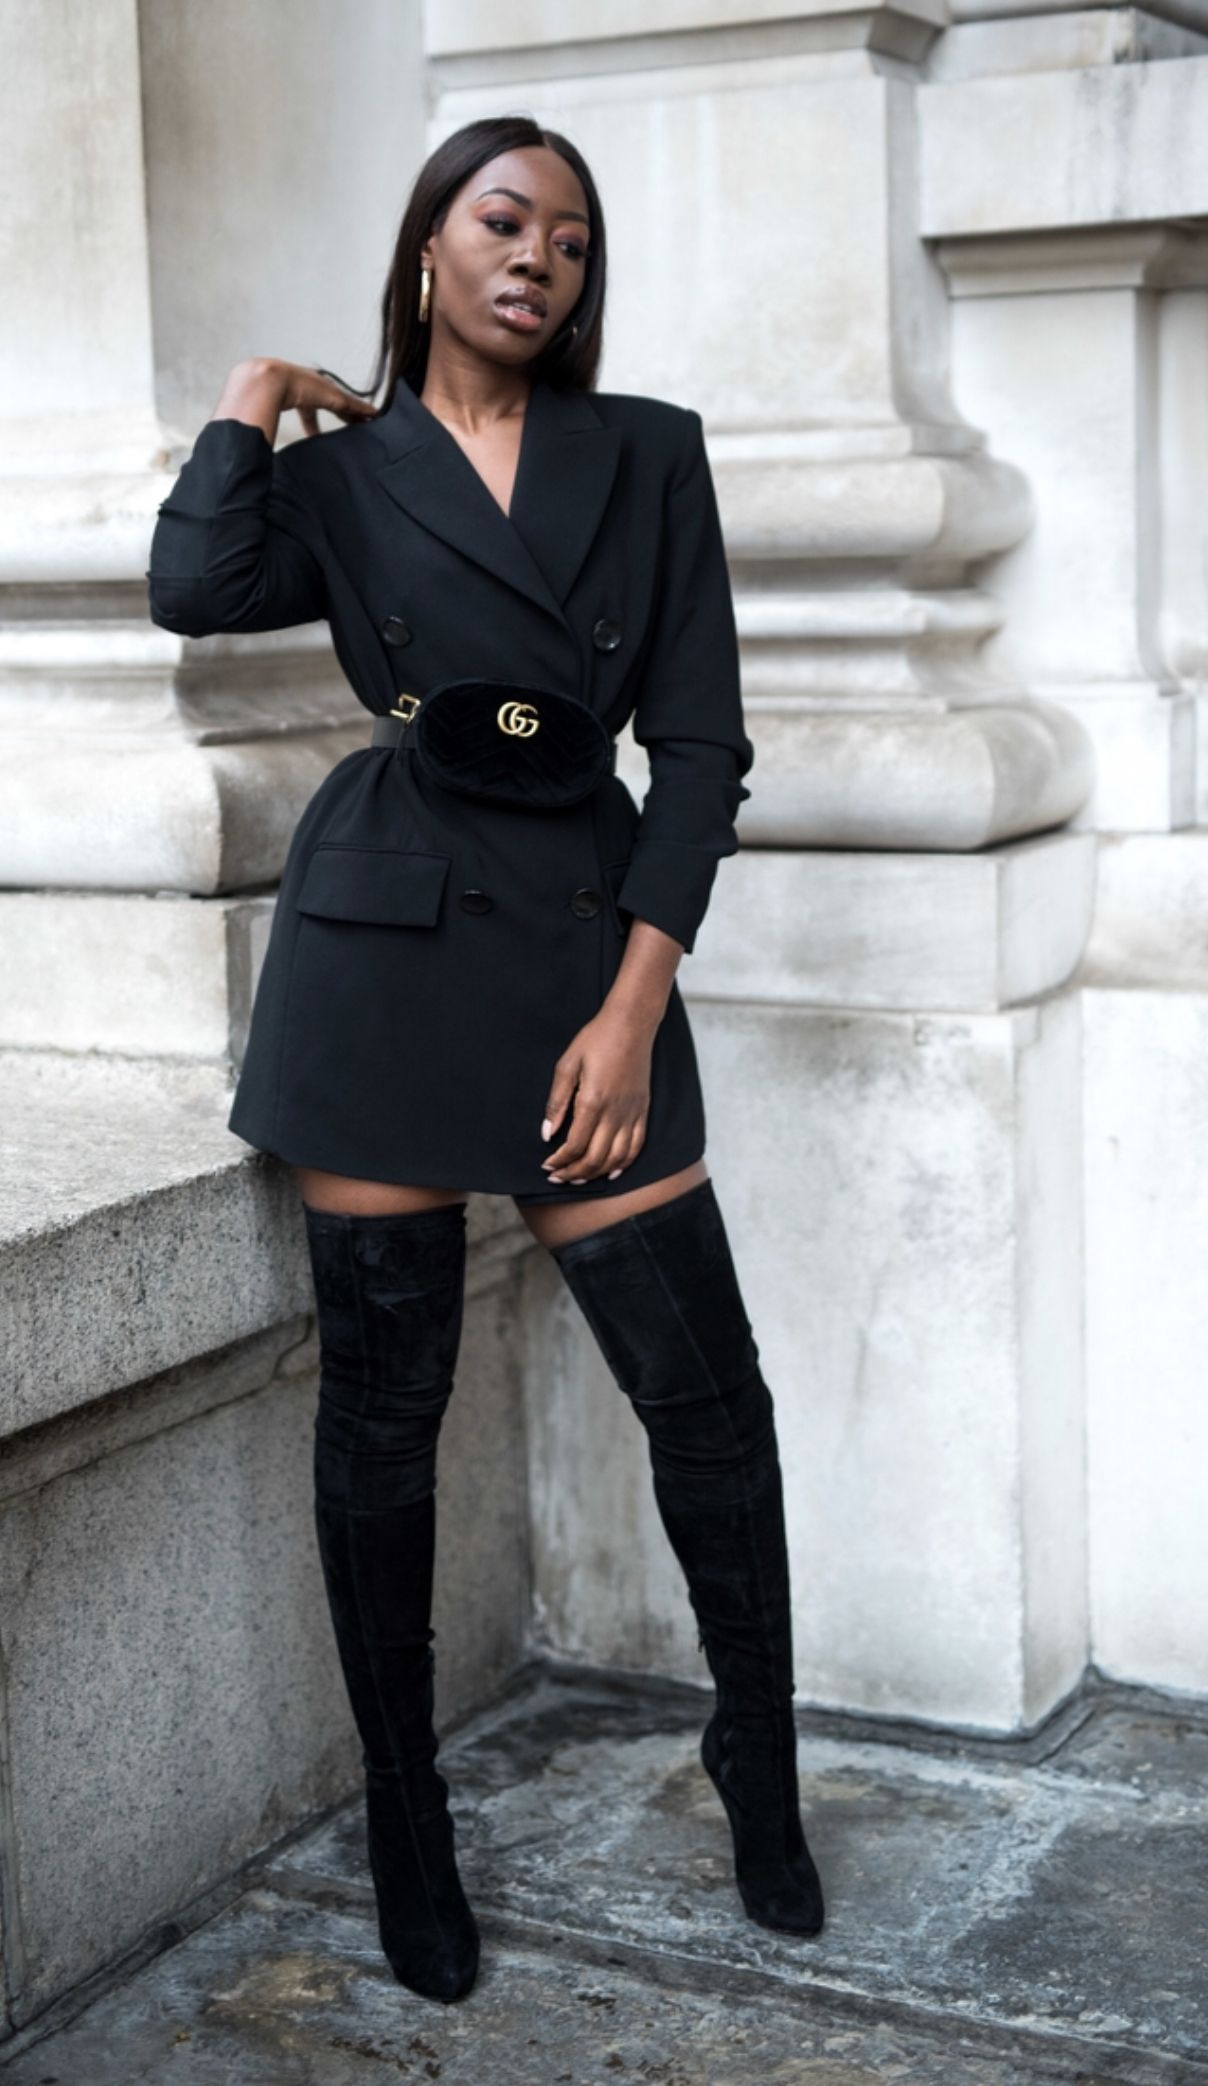 bffa7bfda Gucci Belt Bag with High Boots and Long Blazer styled by Melissa Holdbrook-  Akposoe (Melissa's Wardrobe blog)